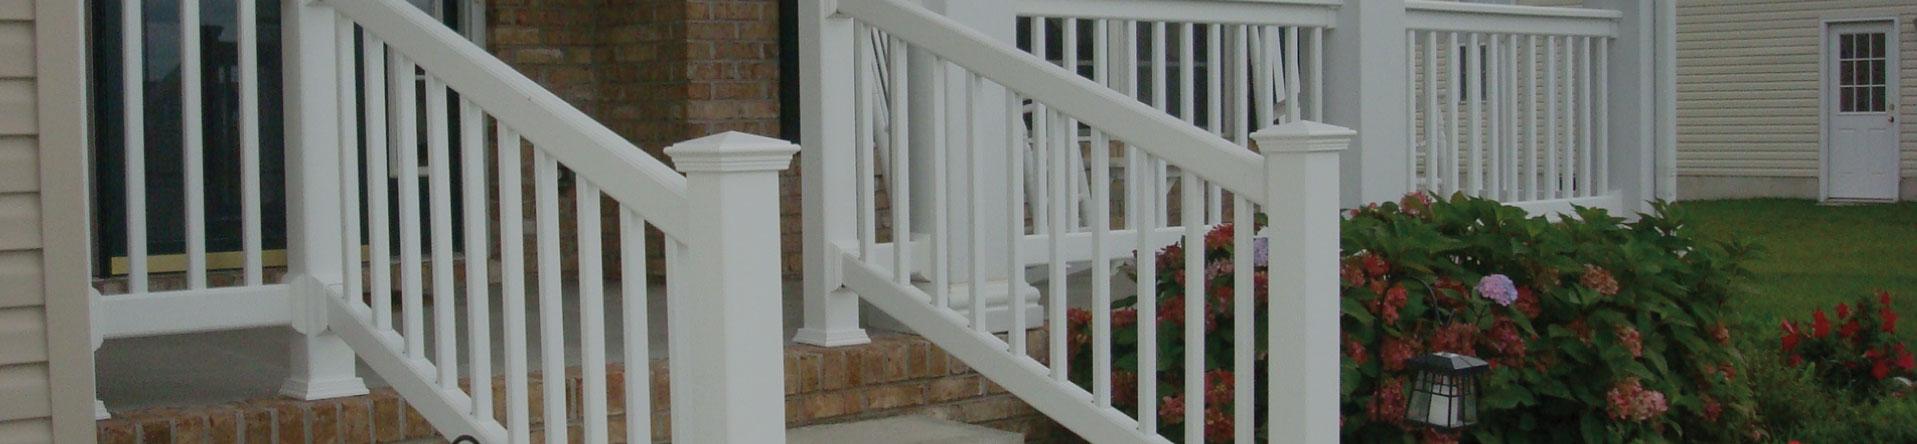 porch railings va beach